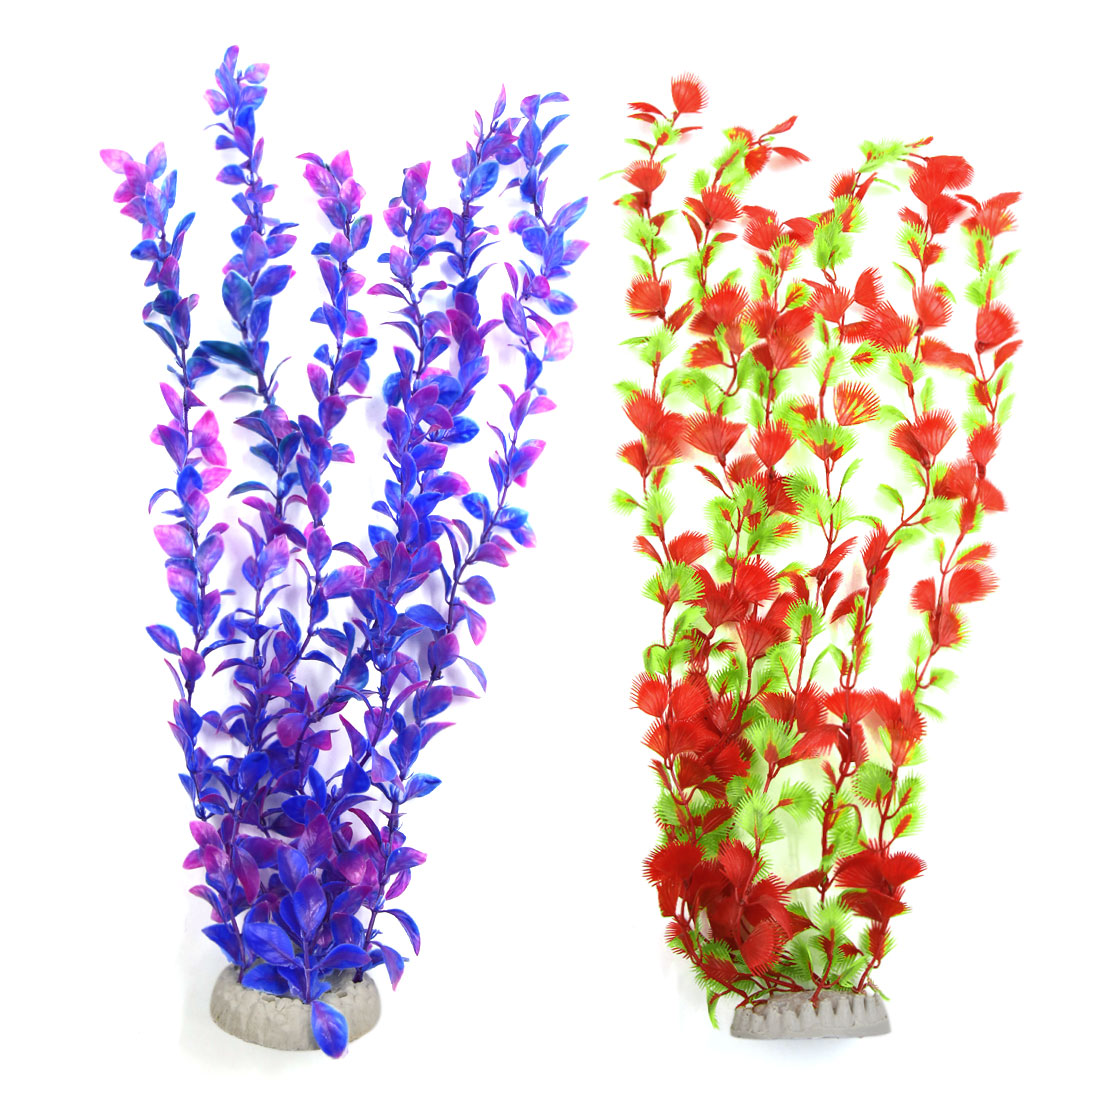 2Pcs Red Purple Plastic Plant Grass Aquarium Fish Tank Decoration w Ceramic Base